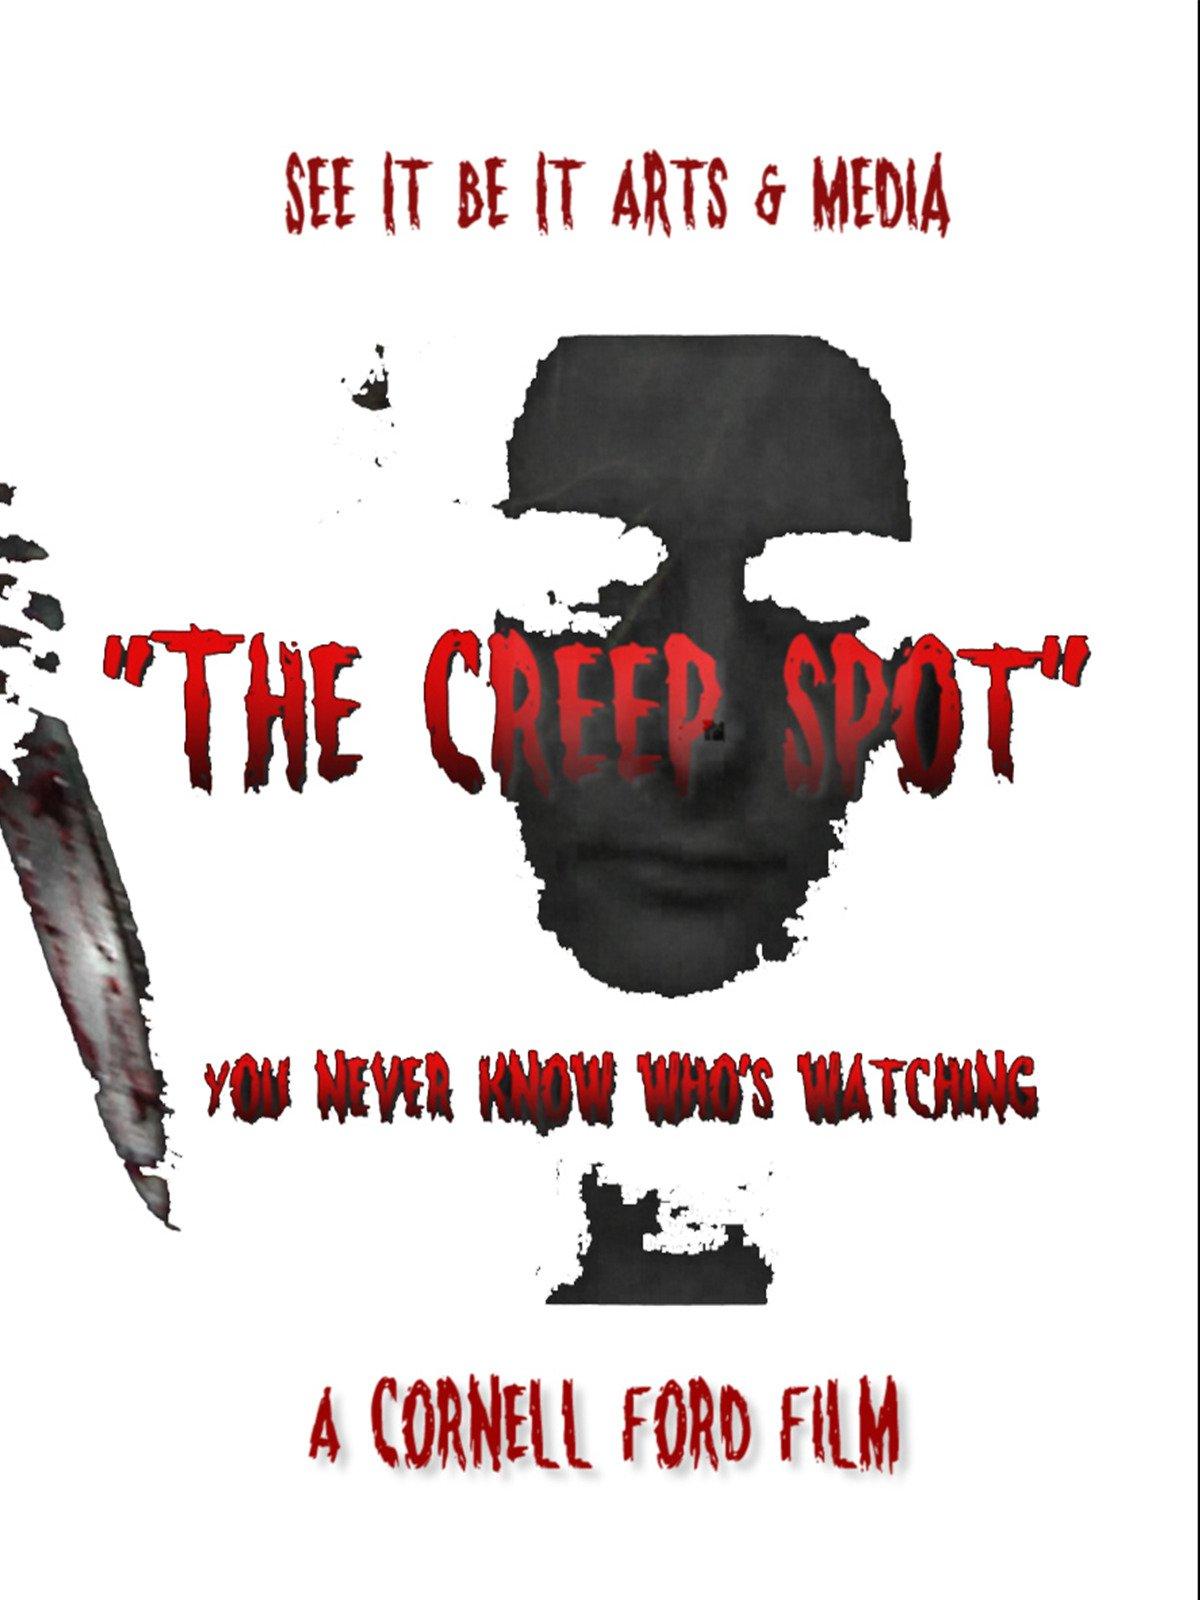 The Creep Spot